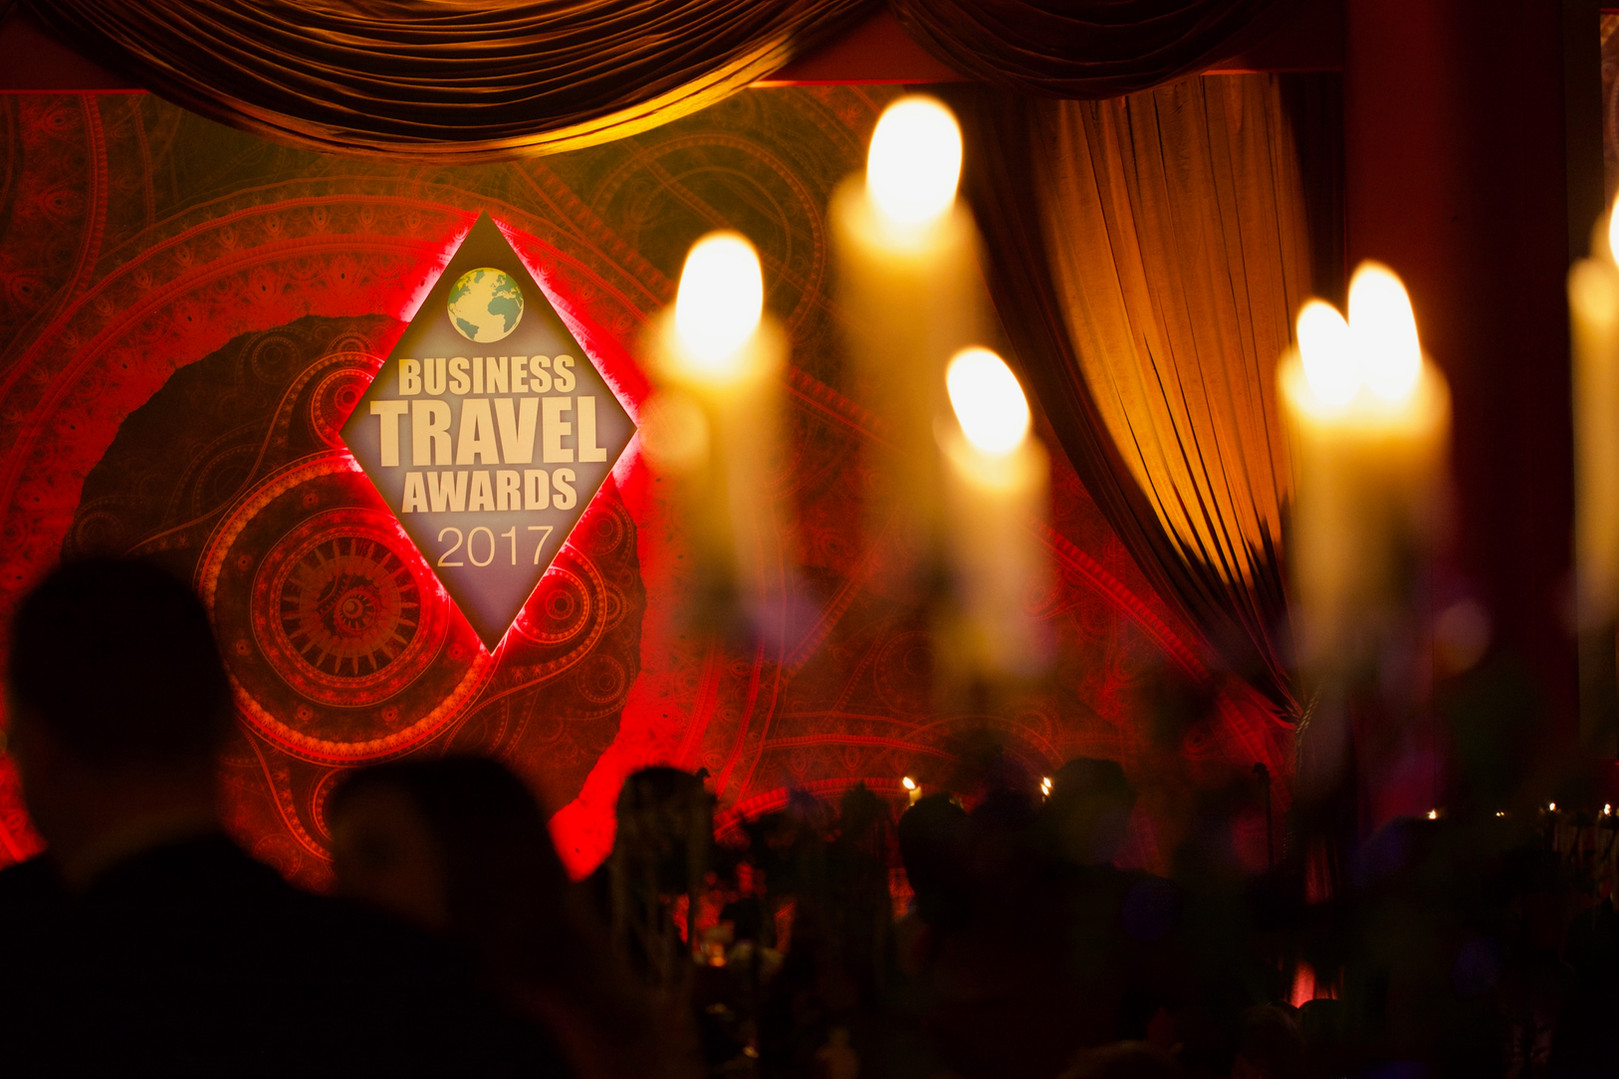 Business Travel Awards